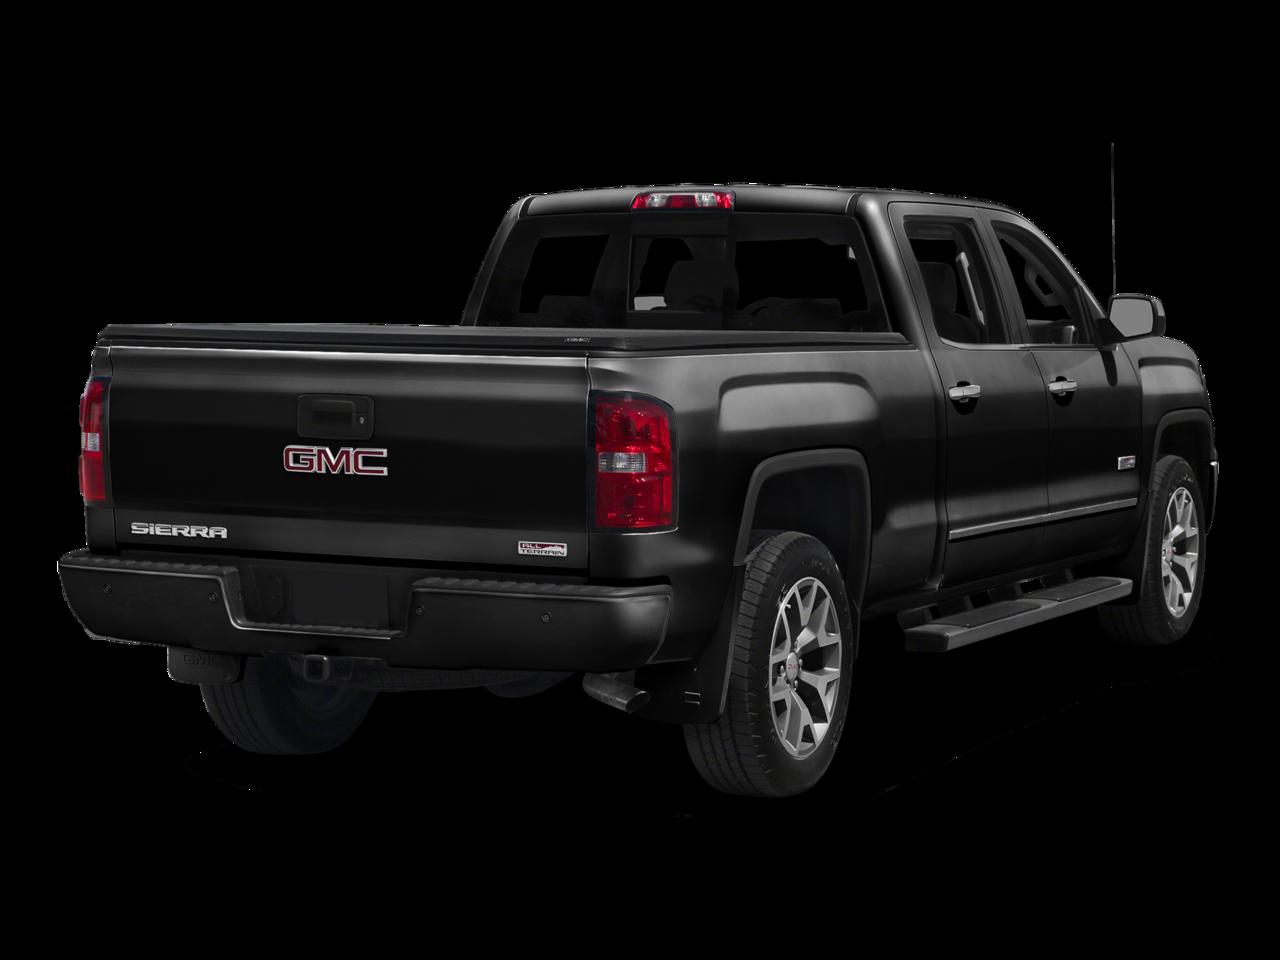 2015 GMC Sierra 1500 Short Bed